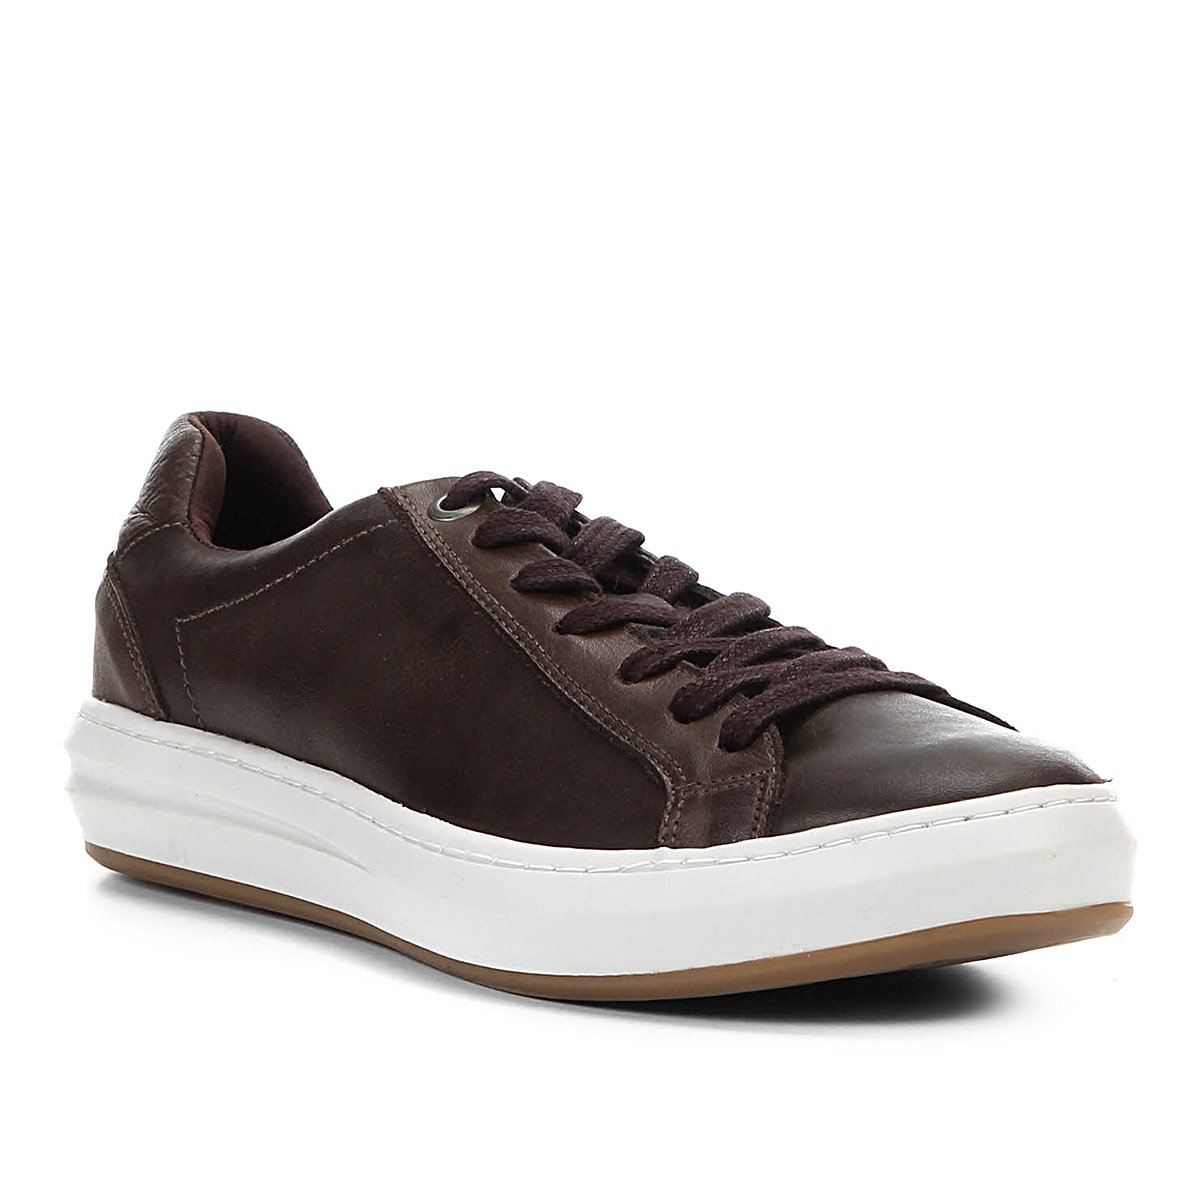 938a9dd2d0 Sapatênis Couro Shoestock Craquele Masculino